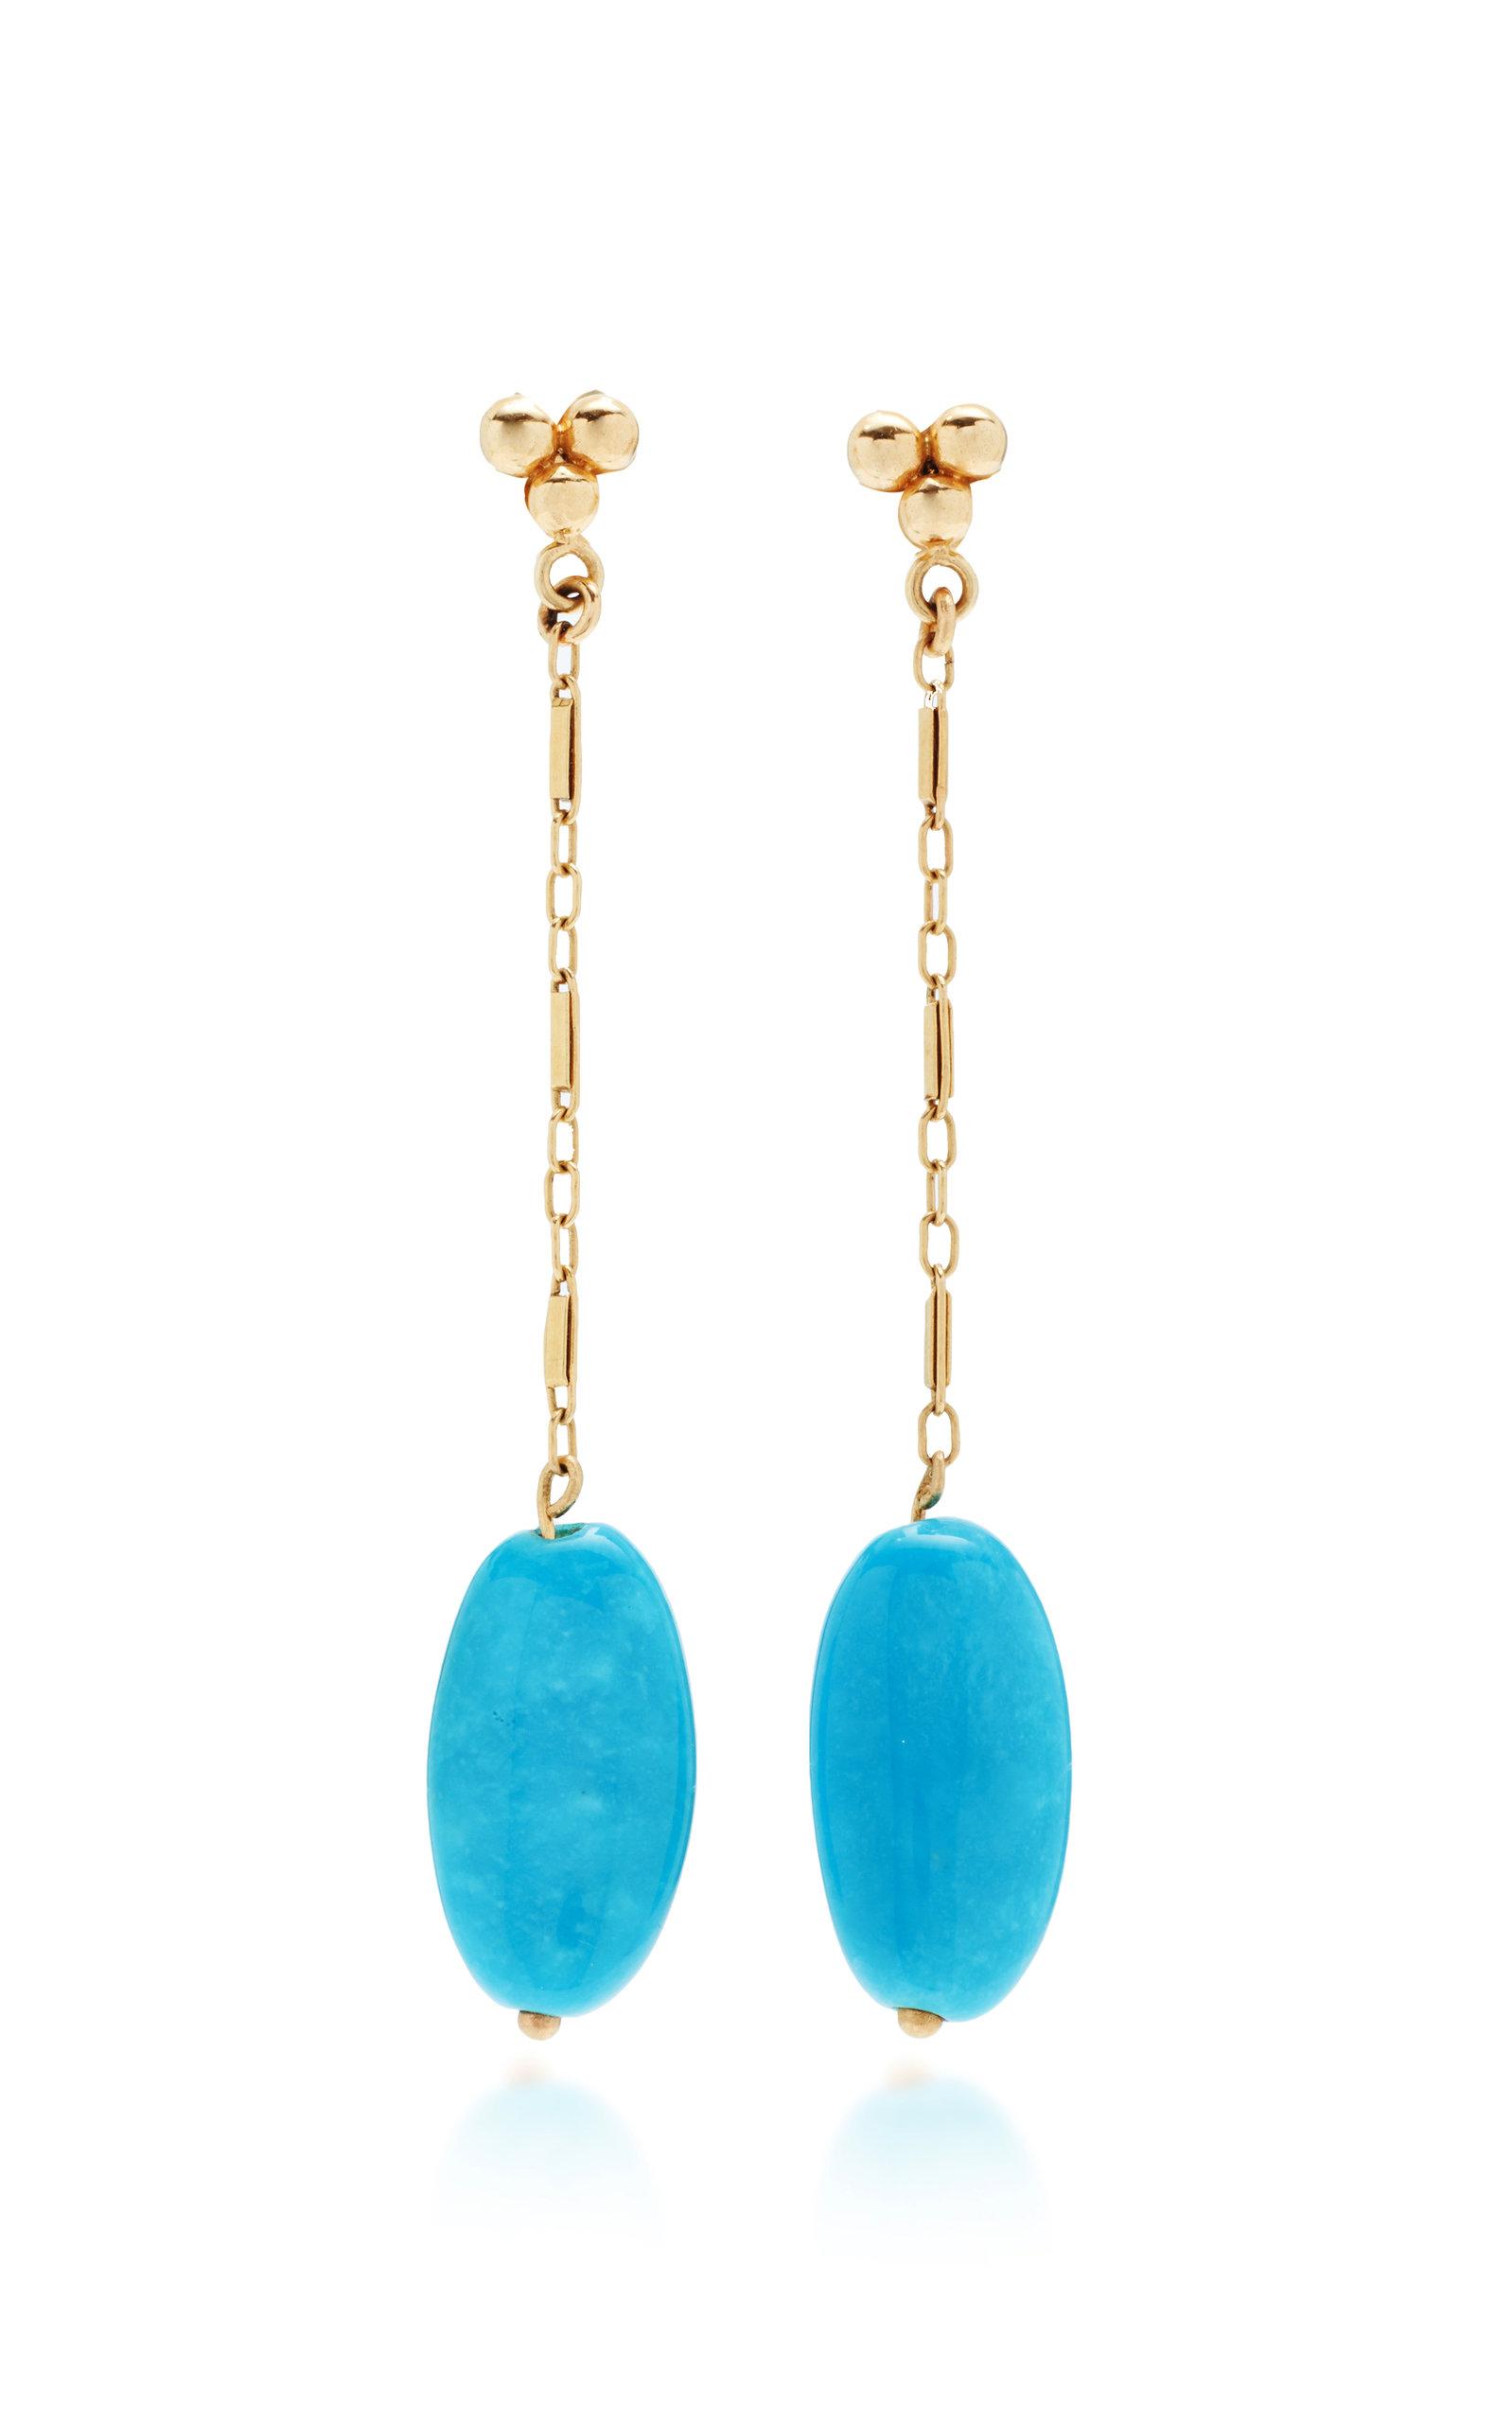 Women's Vintage 18K Yellow Gold Turquoise Earrings